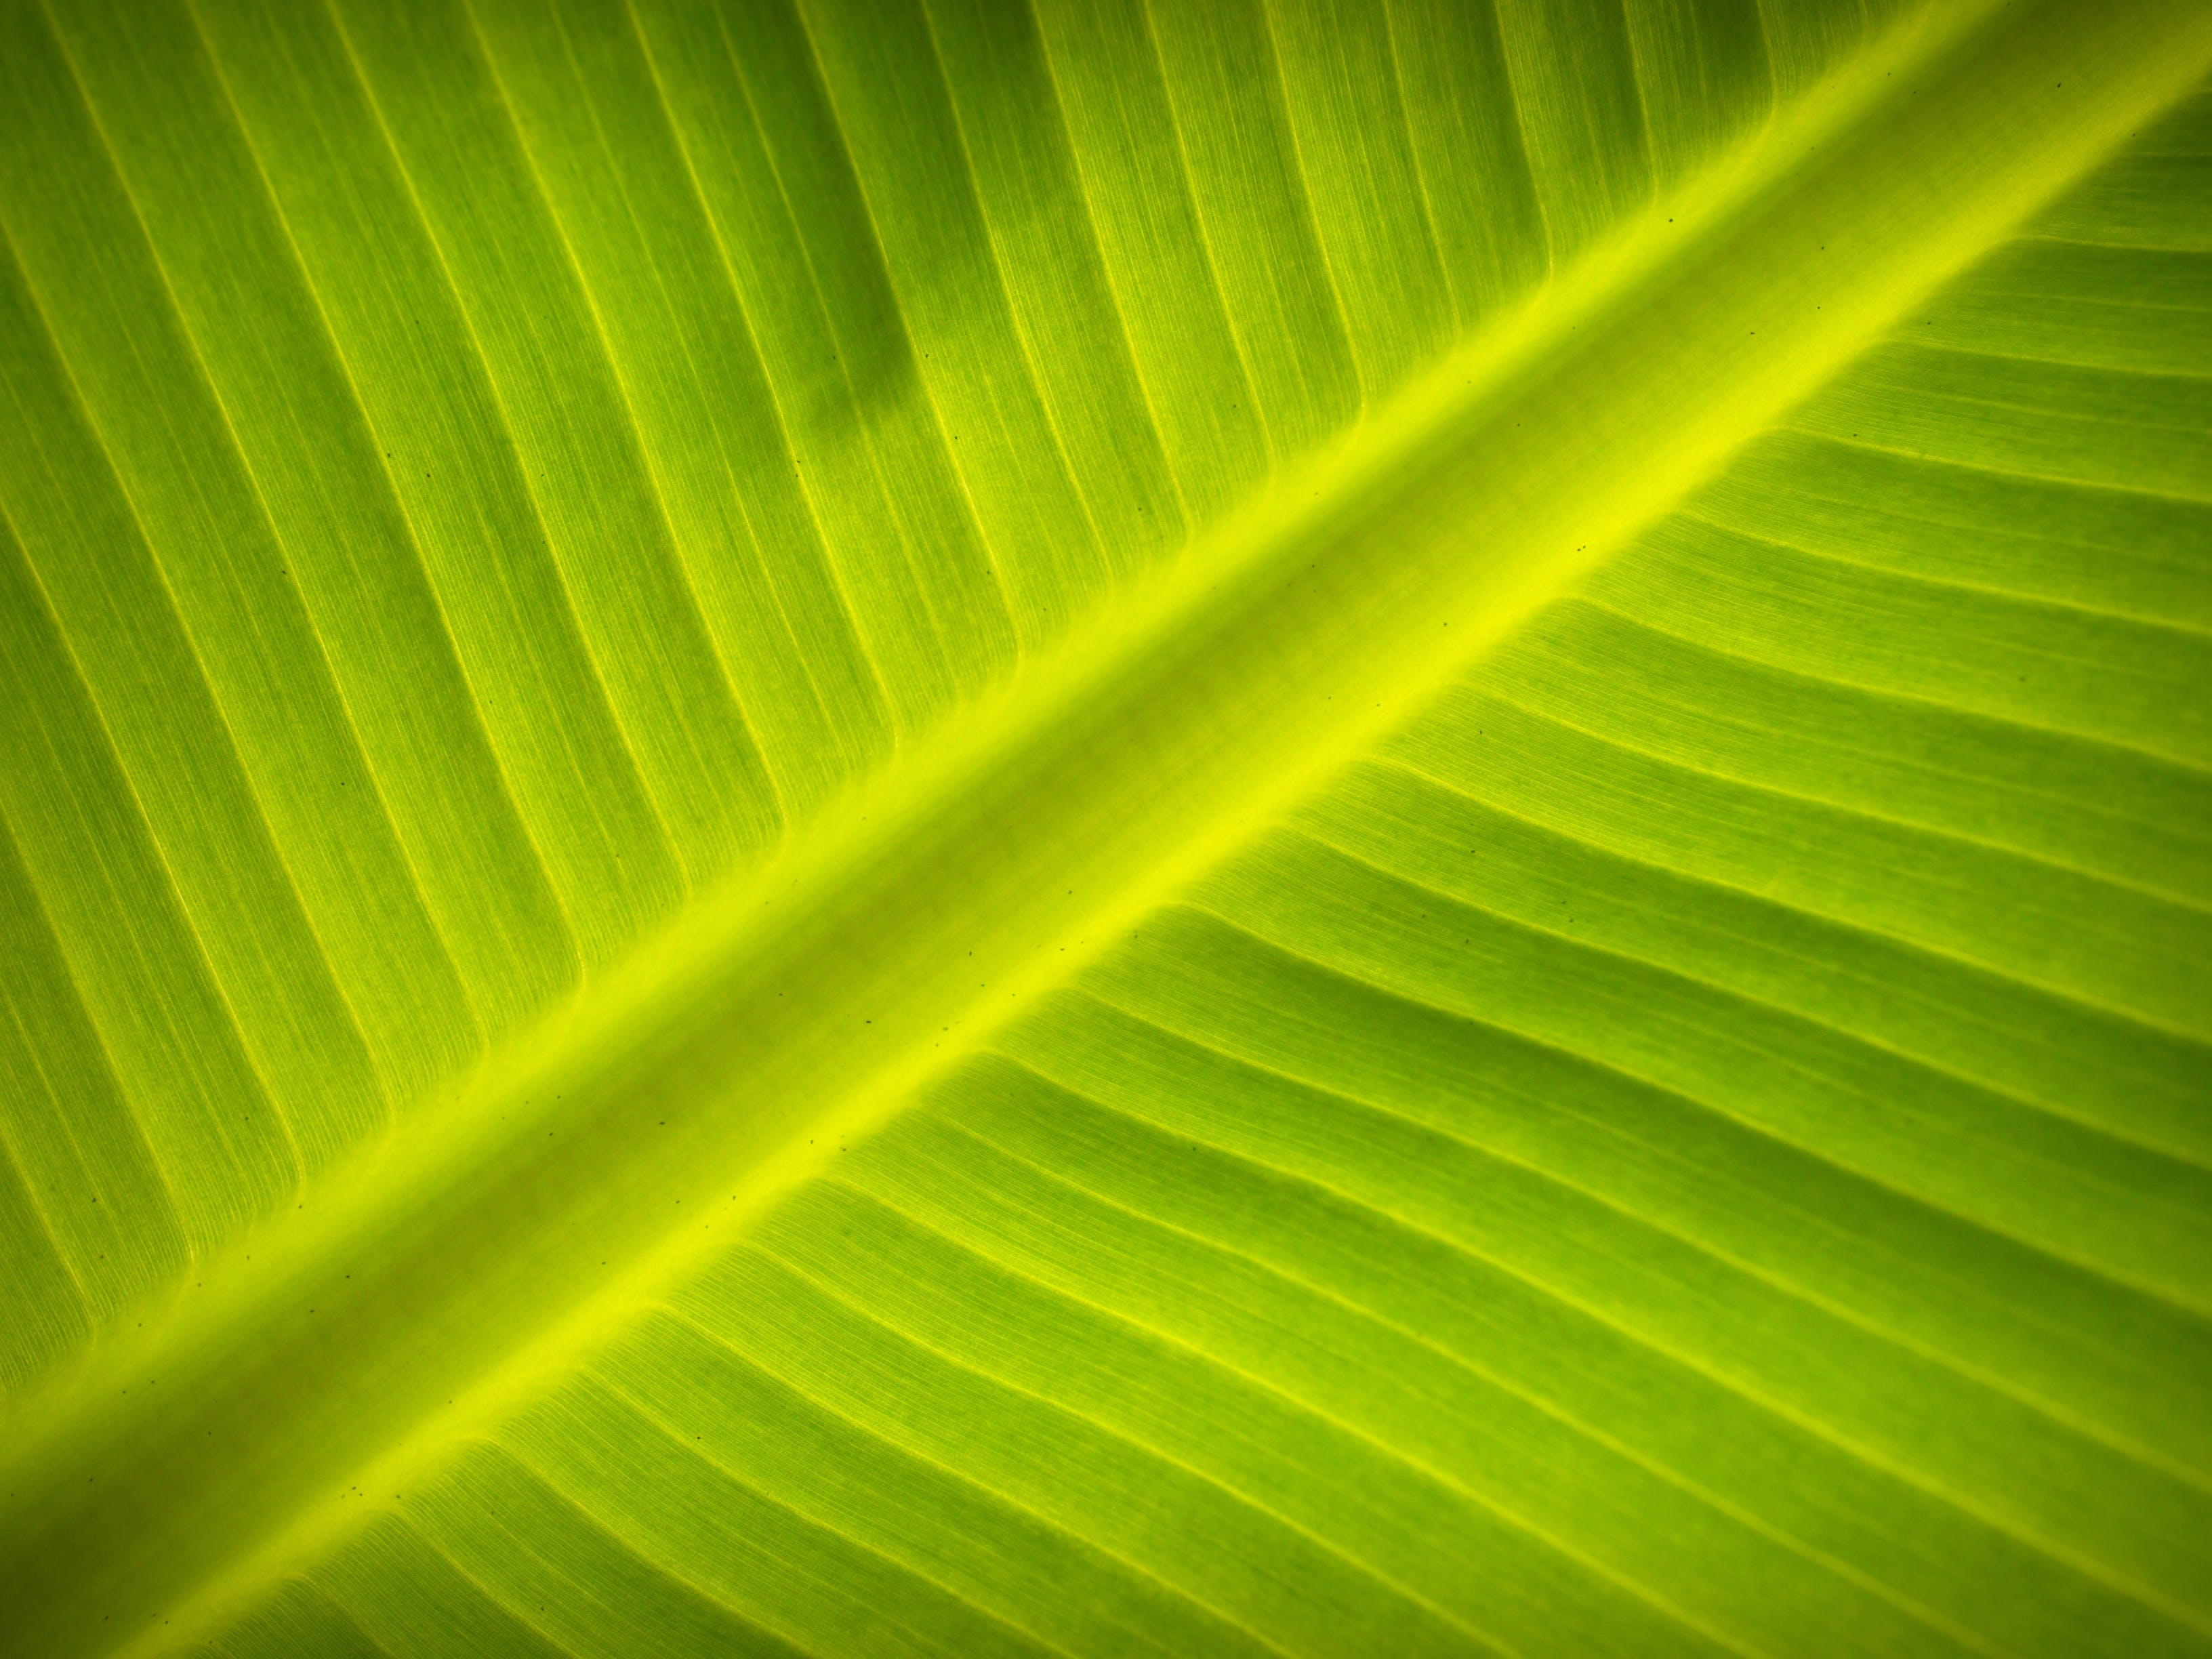 banana leaf, close-up, green